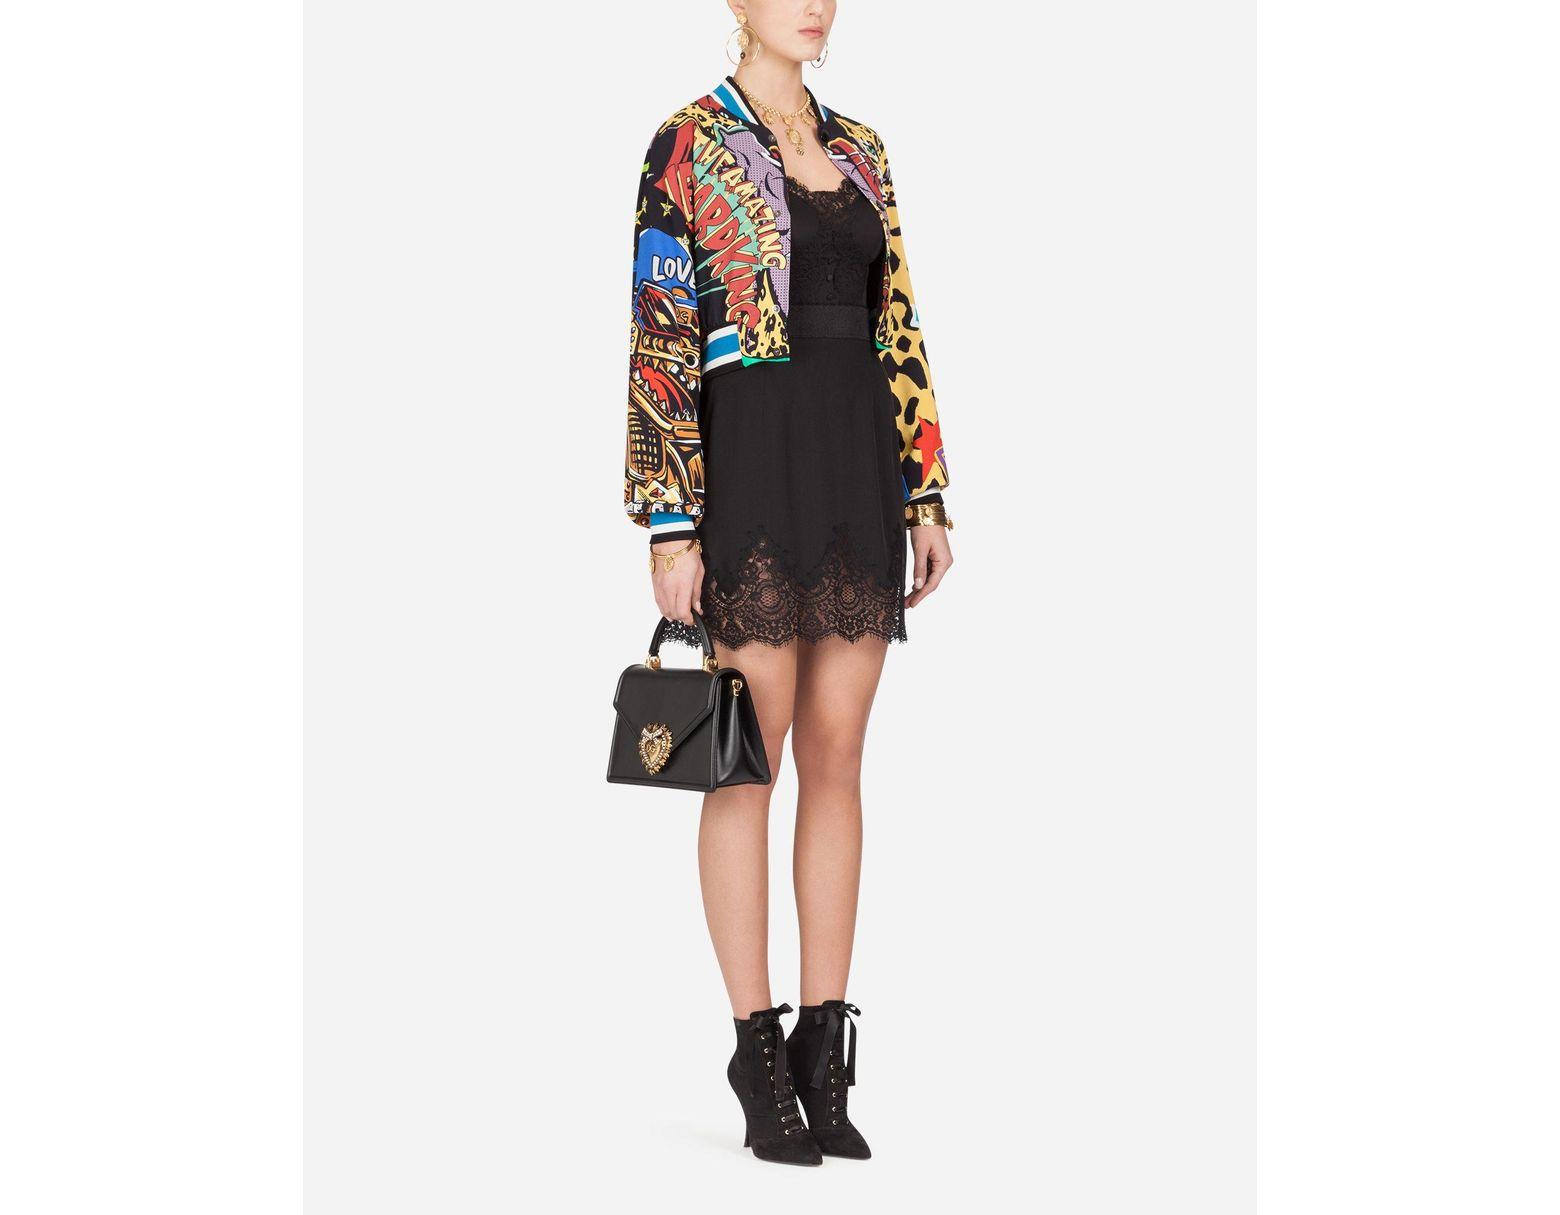 fcc3d4cb087 Dolce & Gabbana Short Cady Bomber Jacket With Super Heroine Print - Lyst